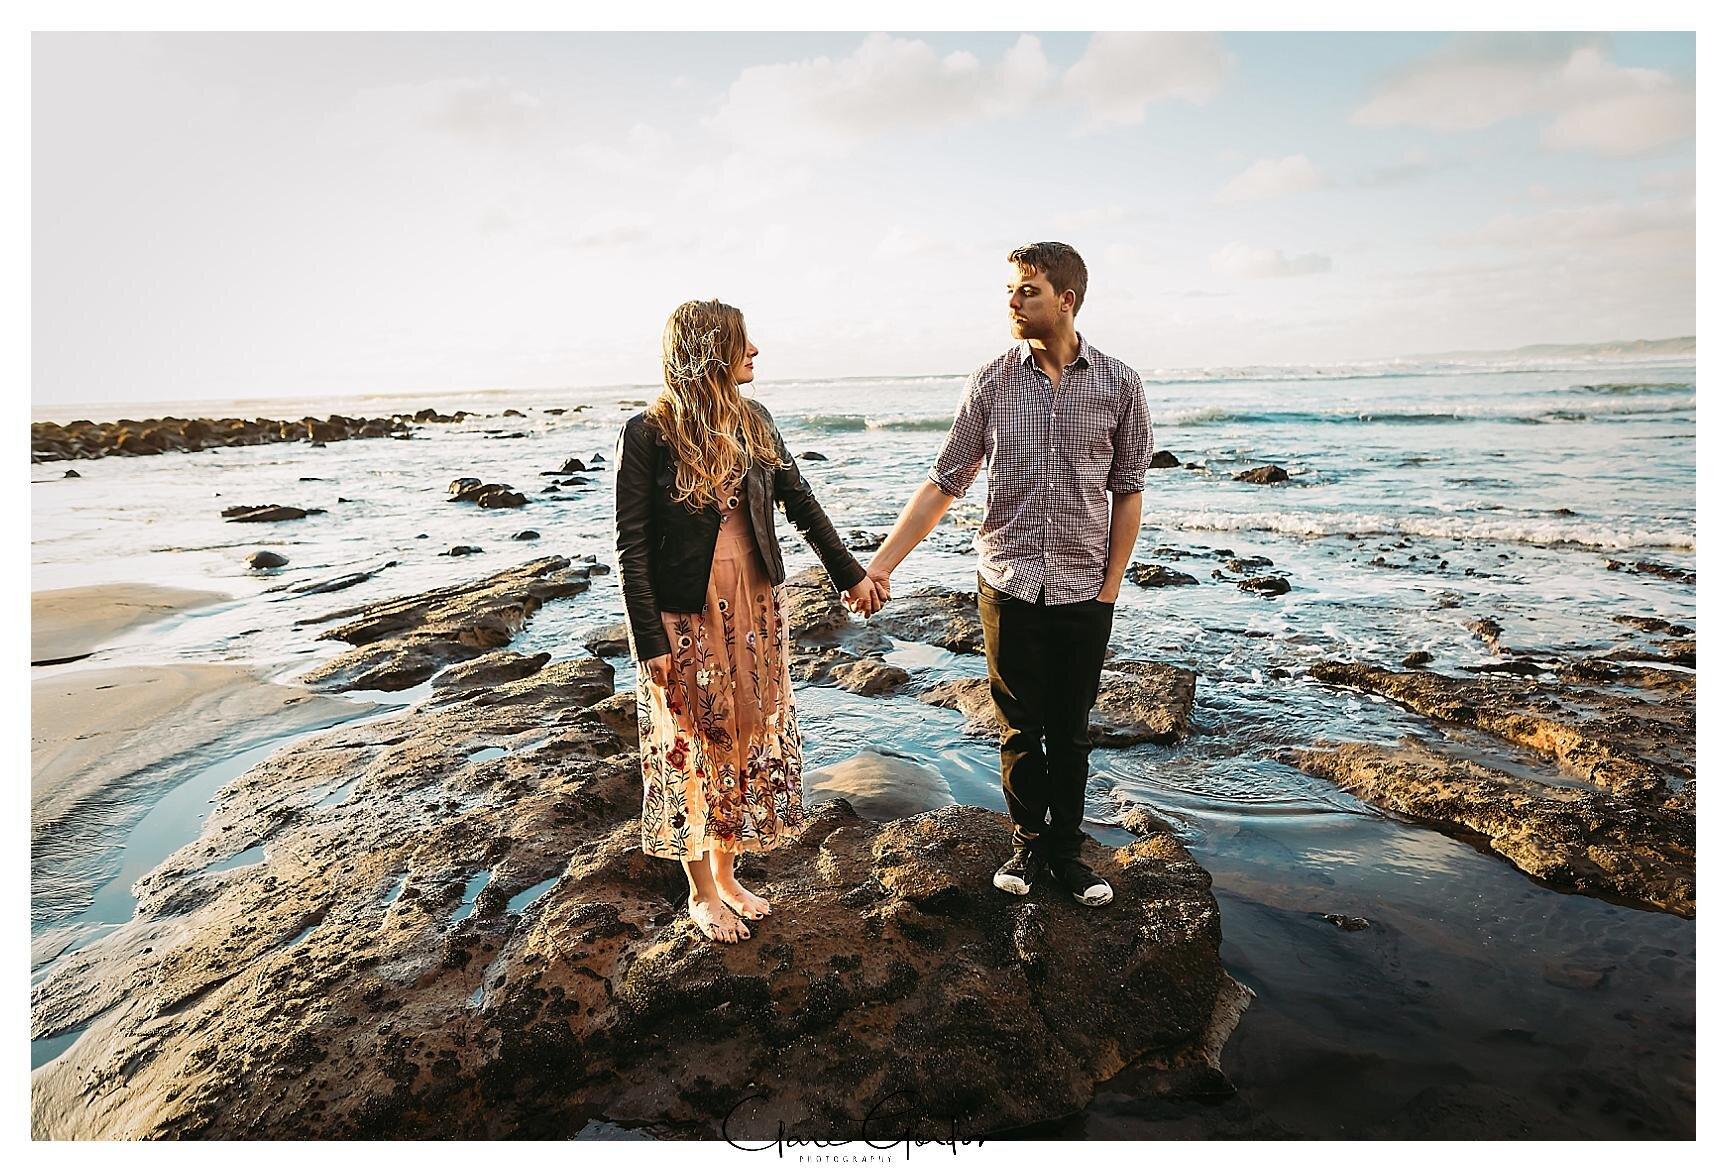 Raglan-beach-NZ-couples-engagement-photos-West-coast-Newzealand (21).jpg